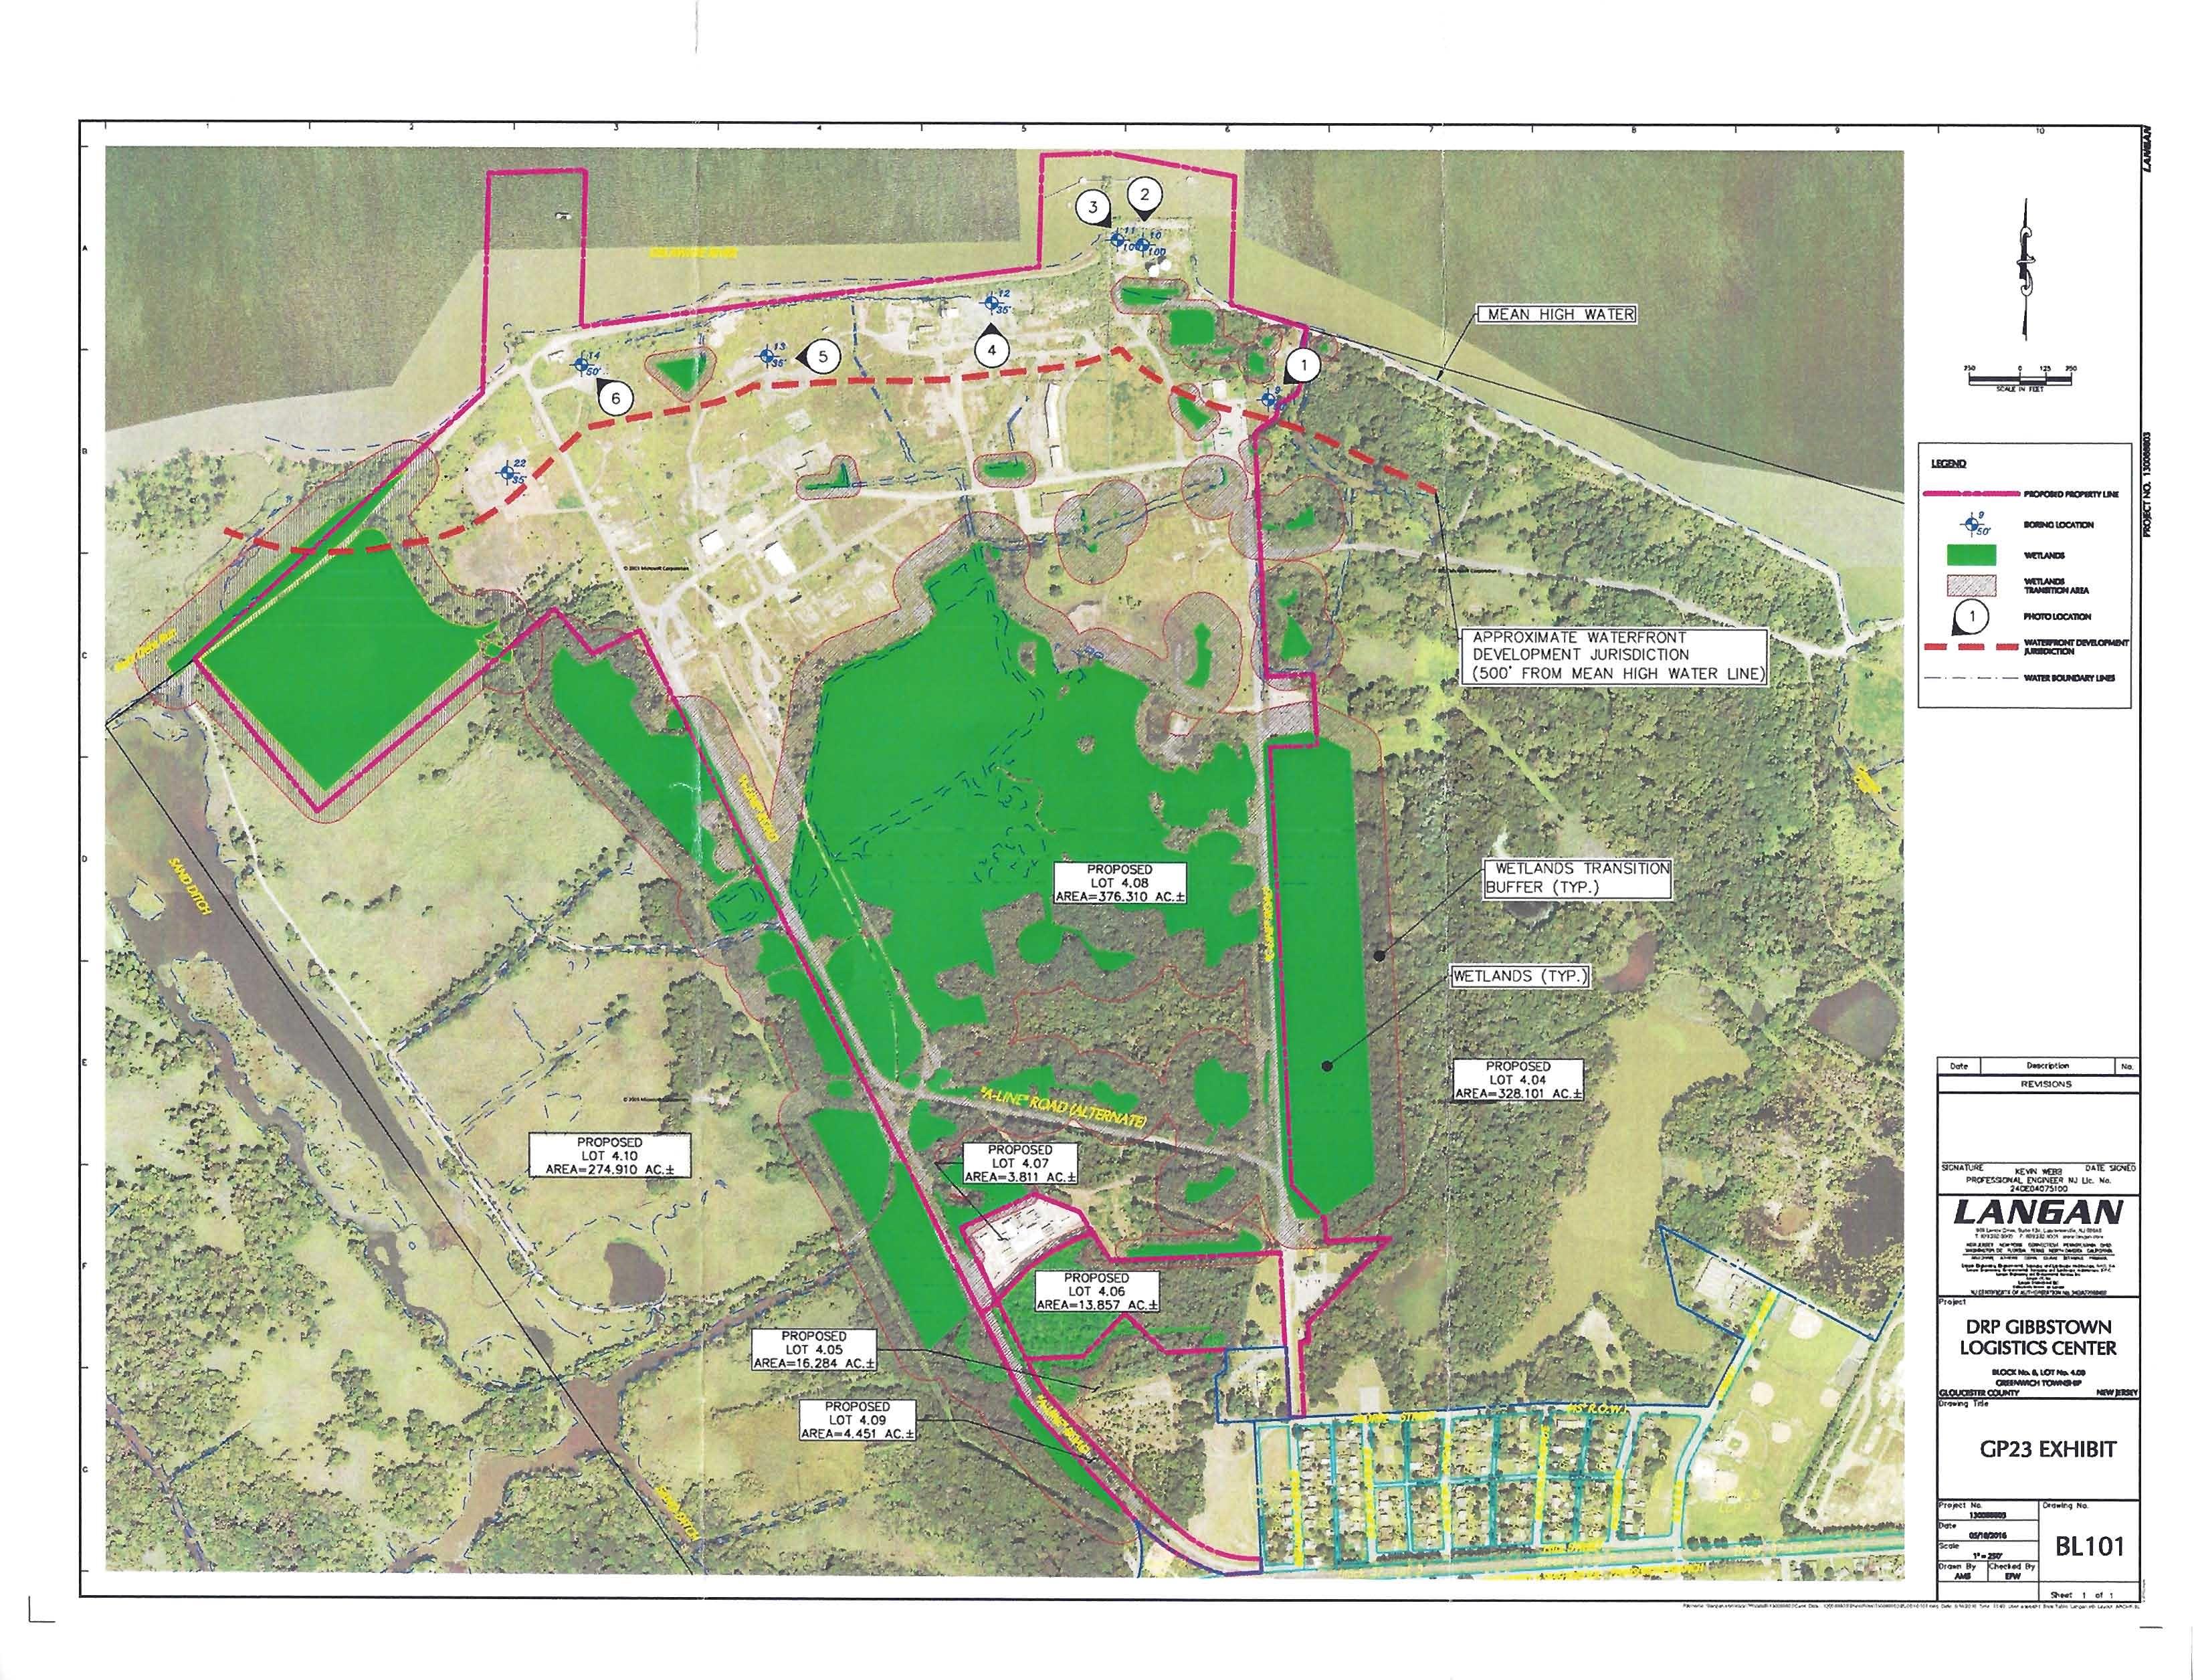 Current Phase Property Boundary